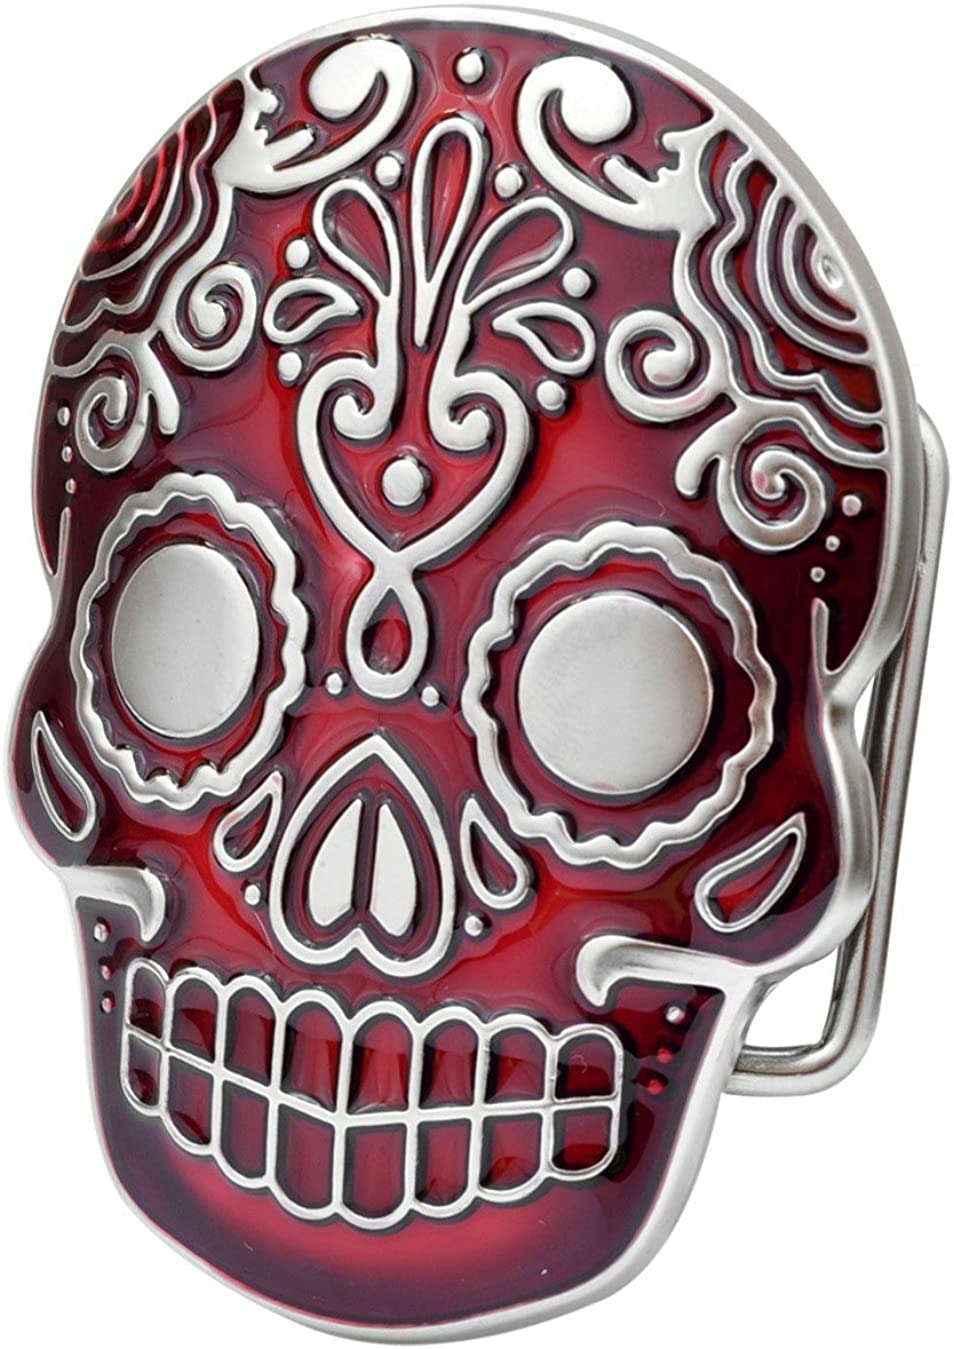 Ivory Falcon online shopping Dia De Los Indefinitely Muertos Buckle Skull Belt Mexican Aztec